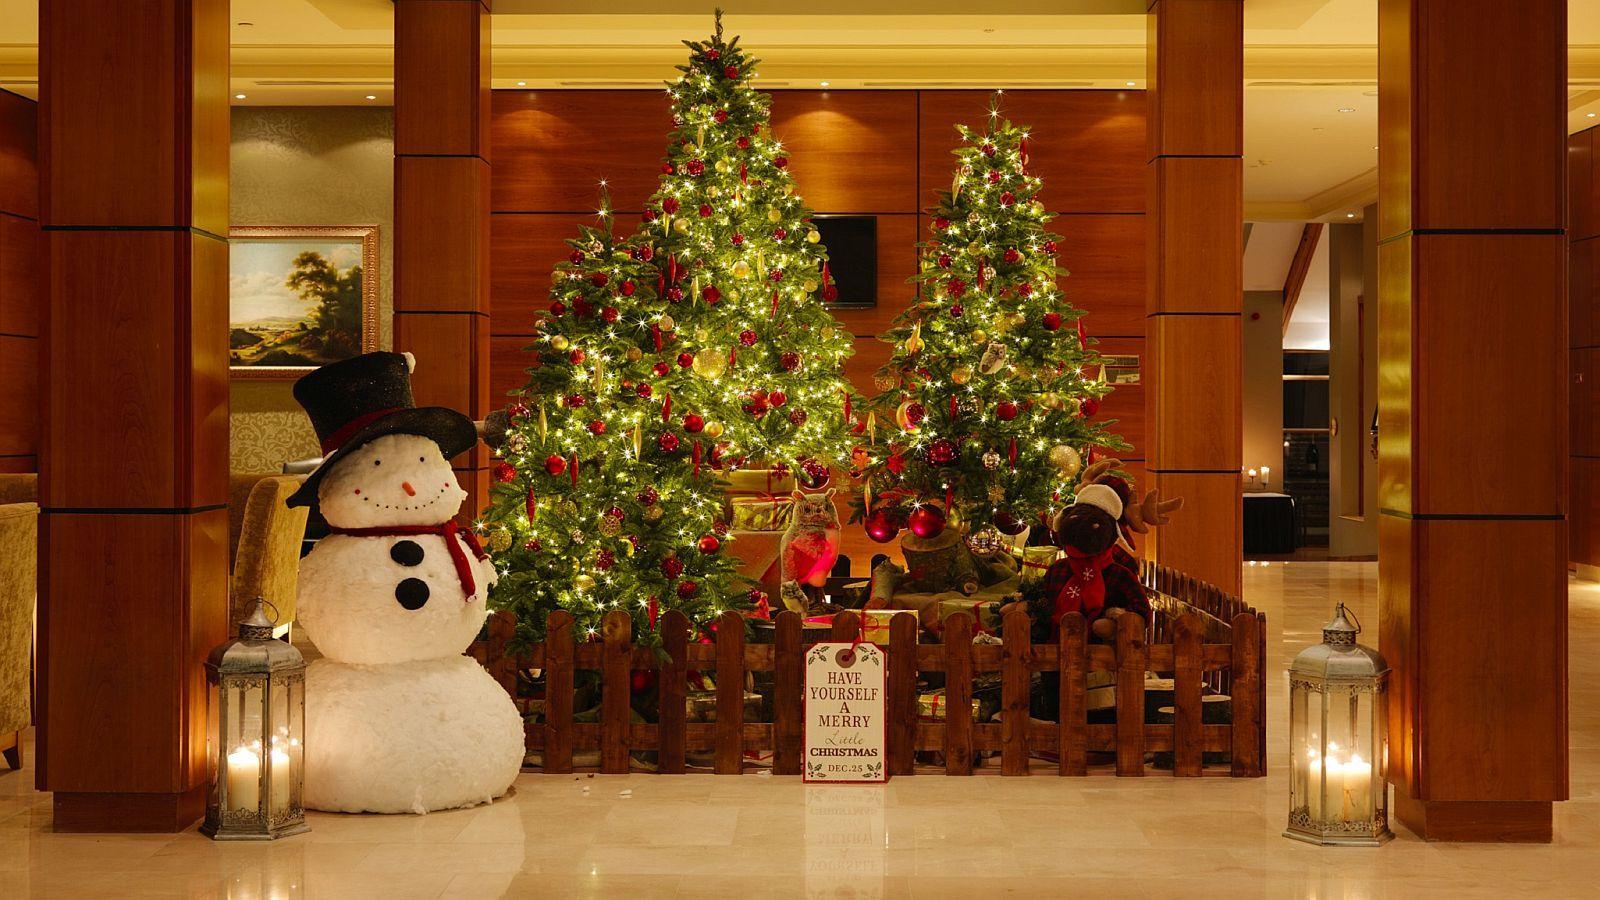 Christmas | Christmas Vouchers | Druids Glen Vouchers